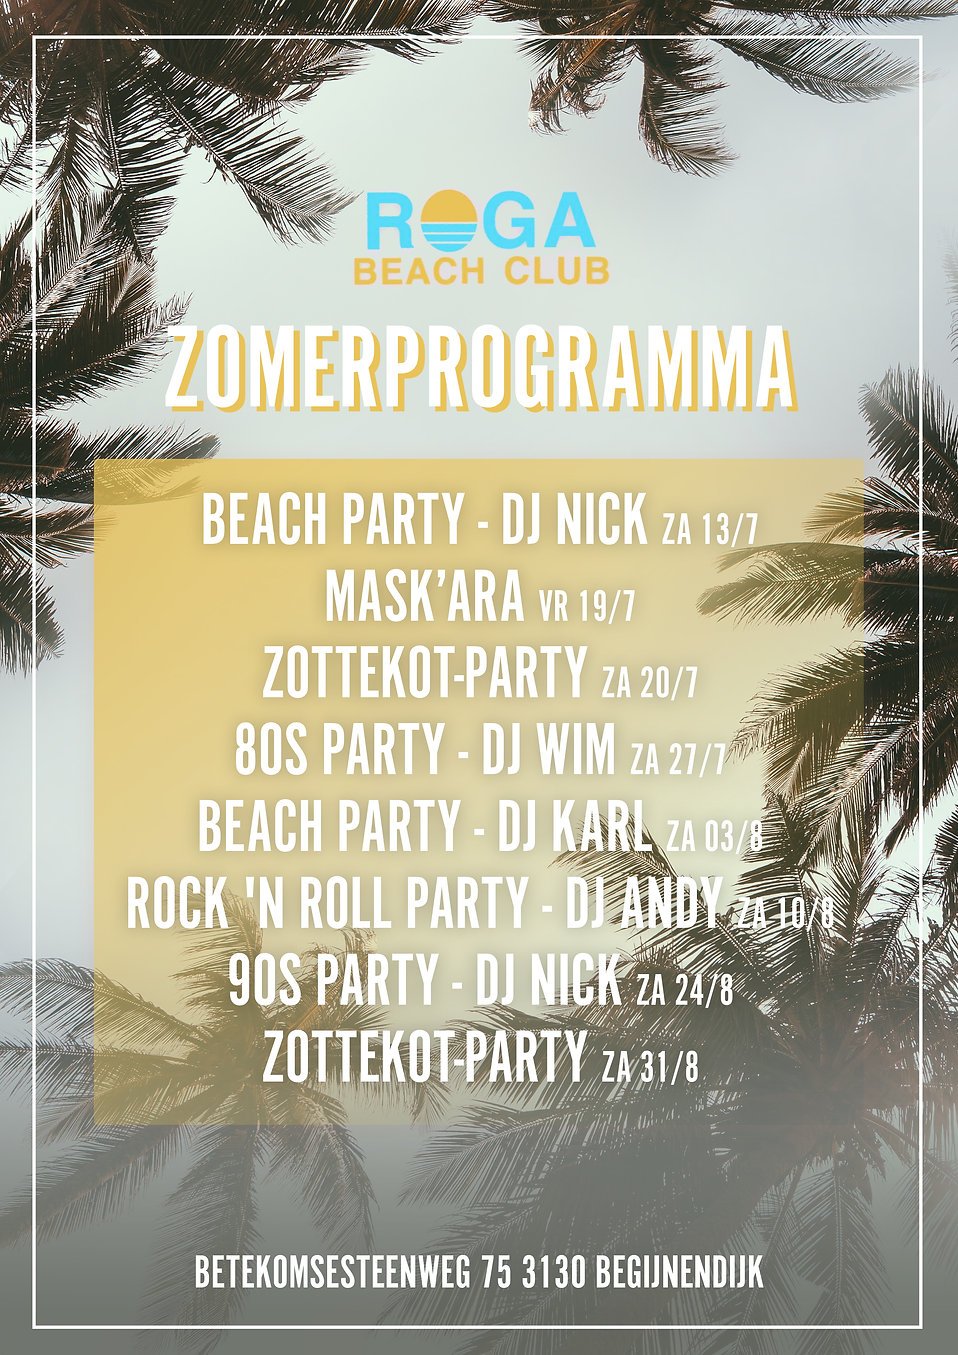 roga_beach.jpg